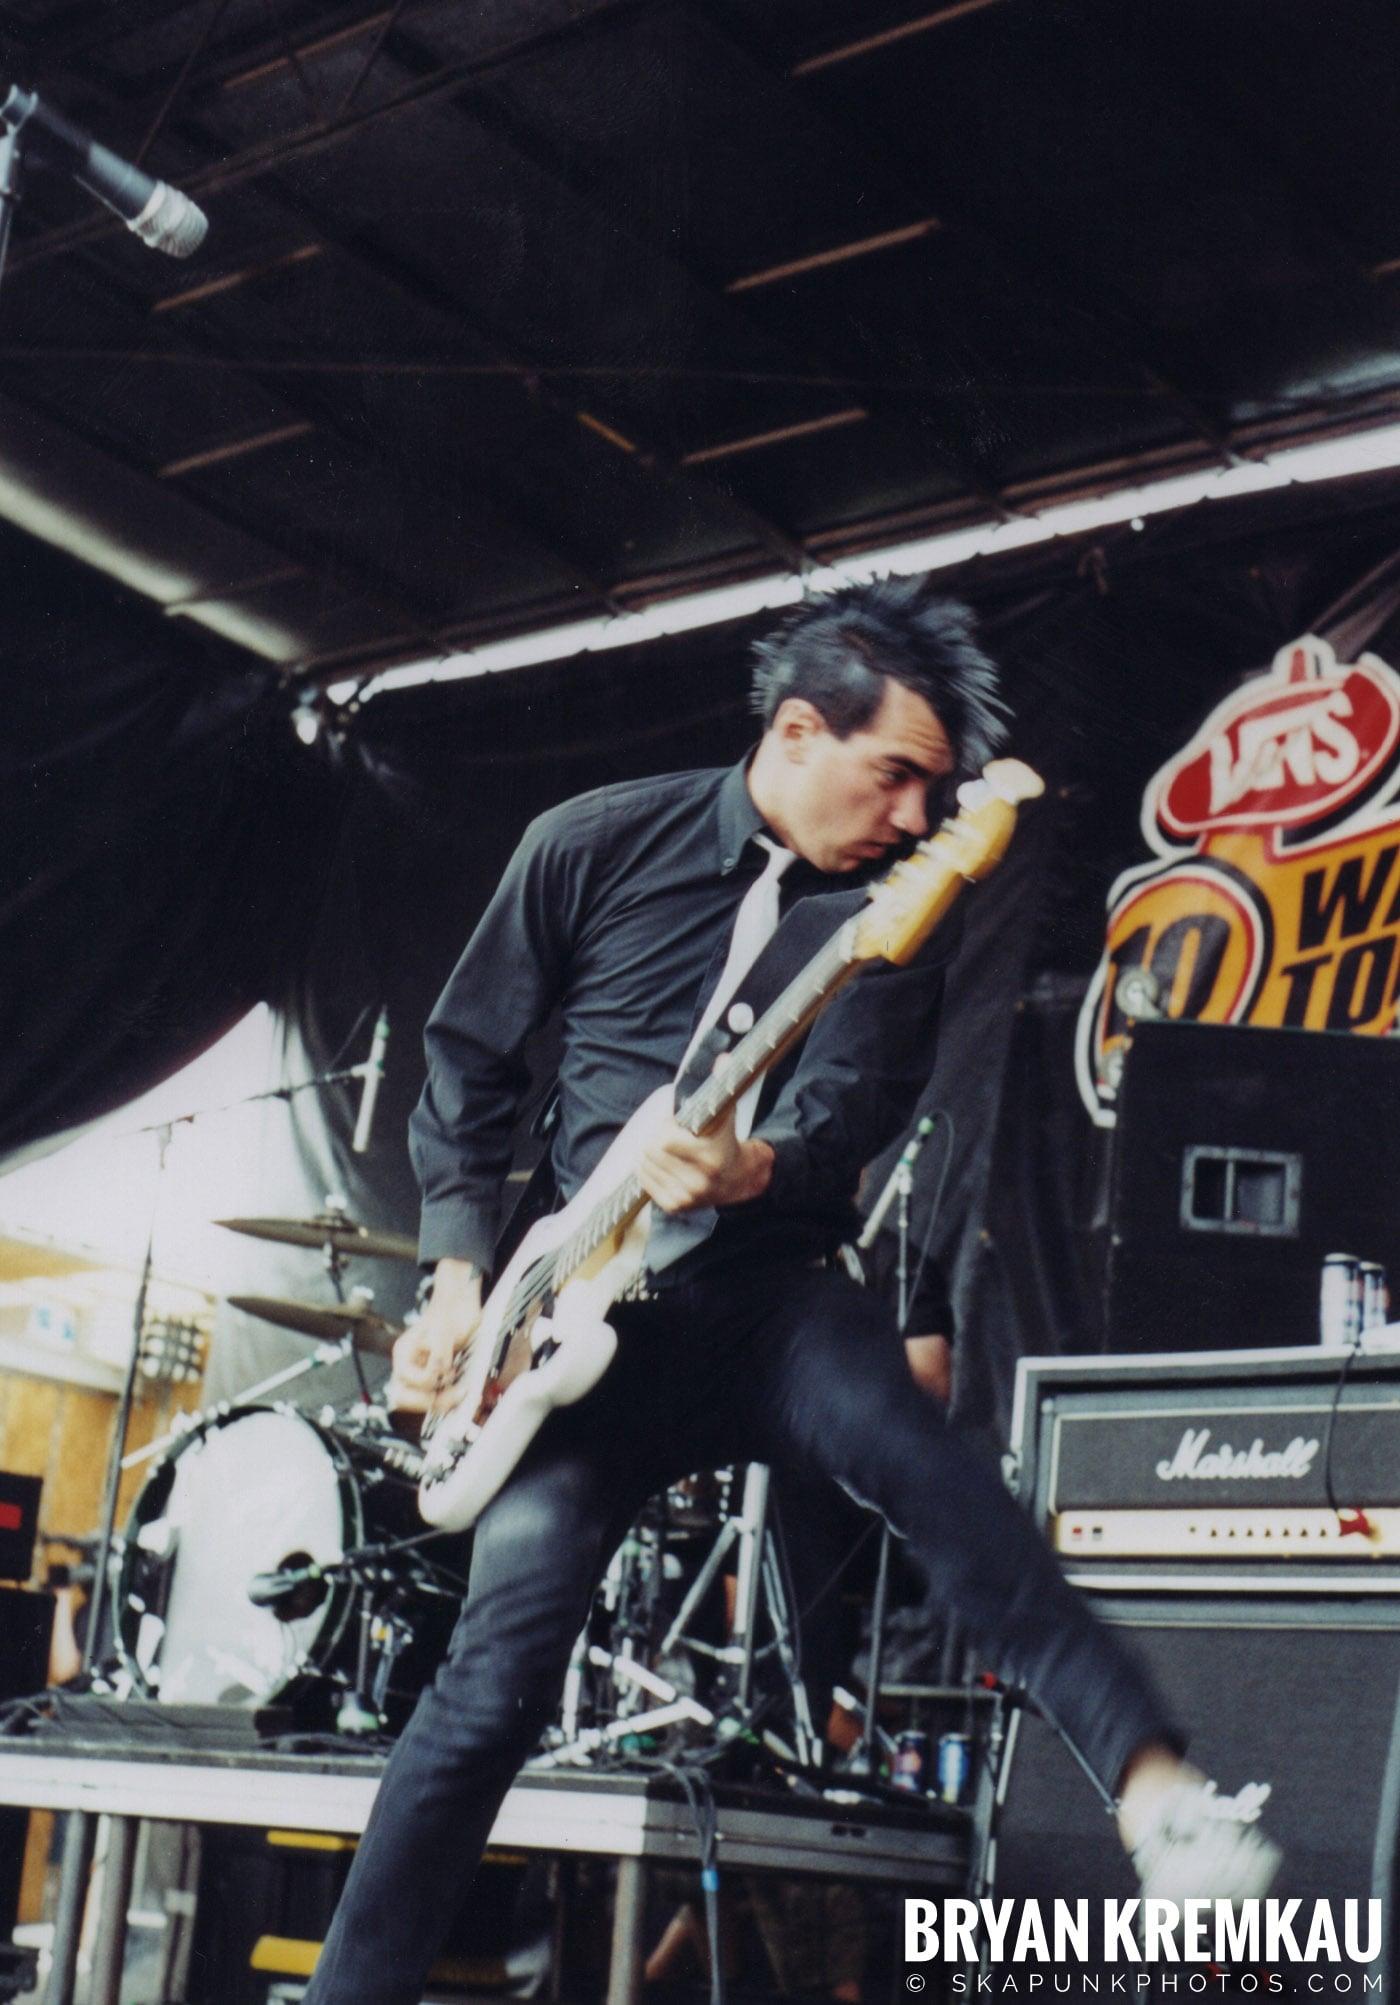 Anti-Flag @ Vans Warped Tour, Randall's Island, NYC - 8.7.04 (3)